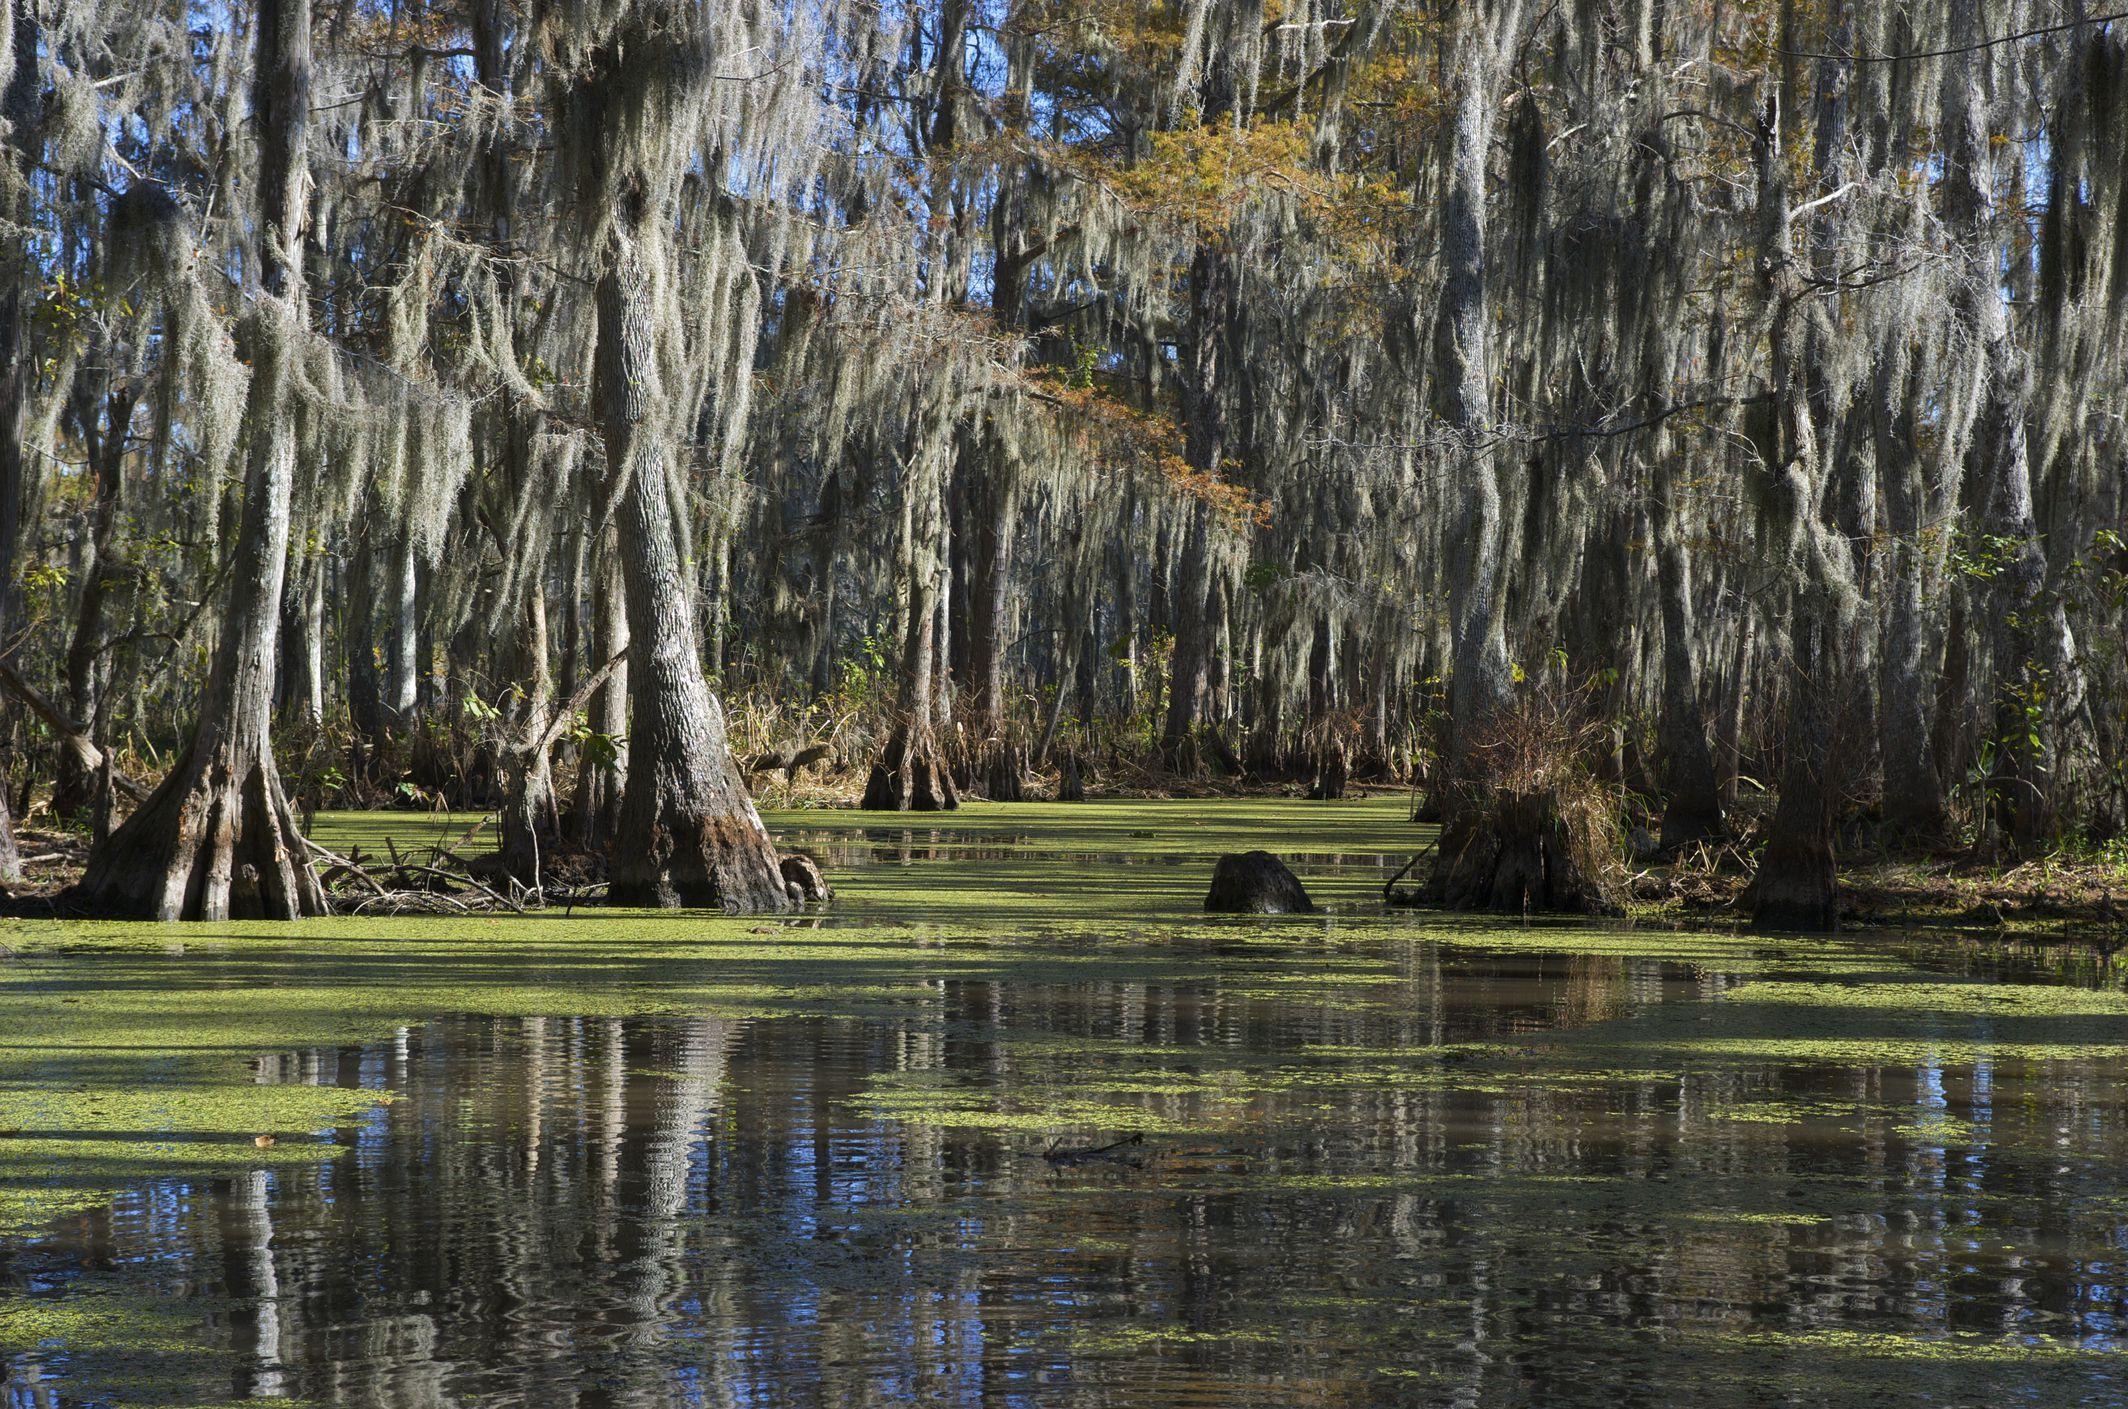 A swamp in Louisiana